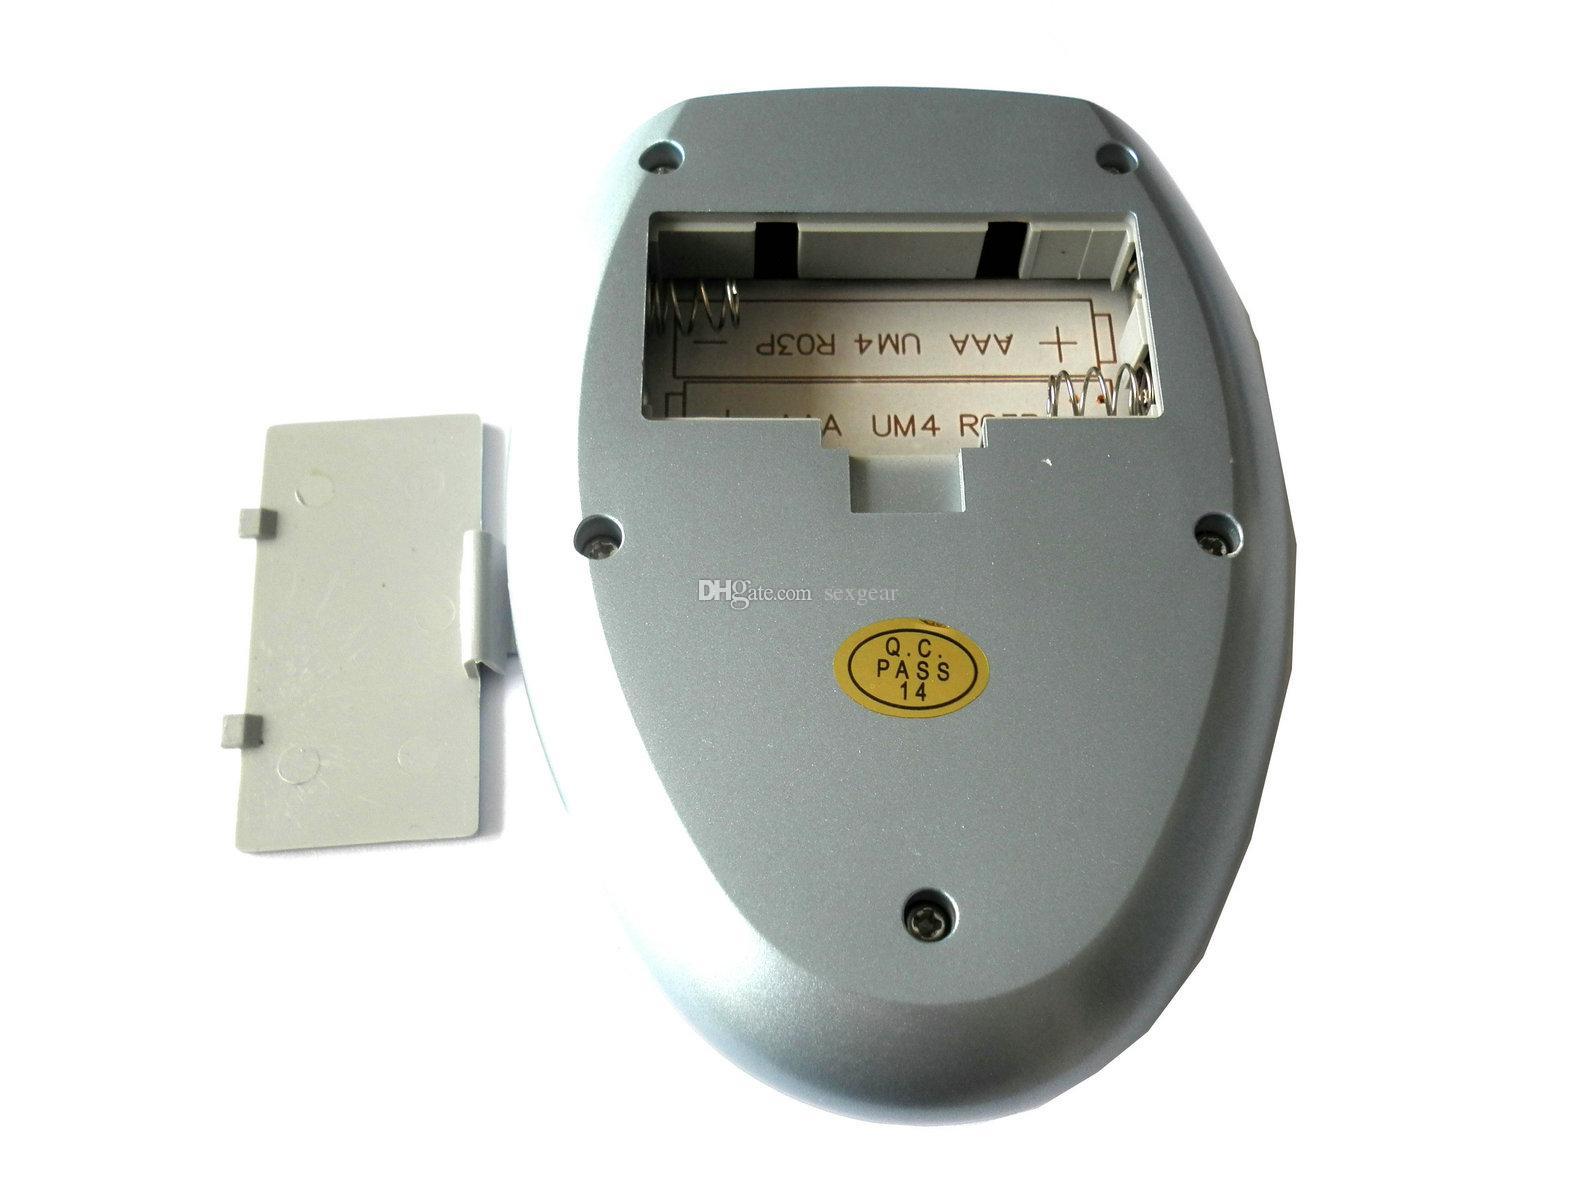 Cuidados de Saúde do agregado familiar Acupuntura Estimulador Massageador Máquina de Saúde Gadgets de Relaxamento Elecric Pulse Shock Massageador de Corpo Inteiro w / 4 Gel Pad